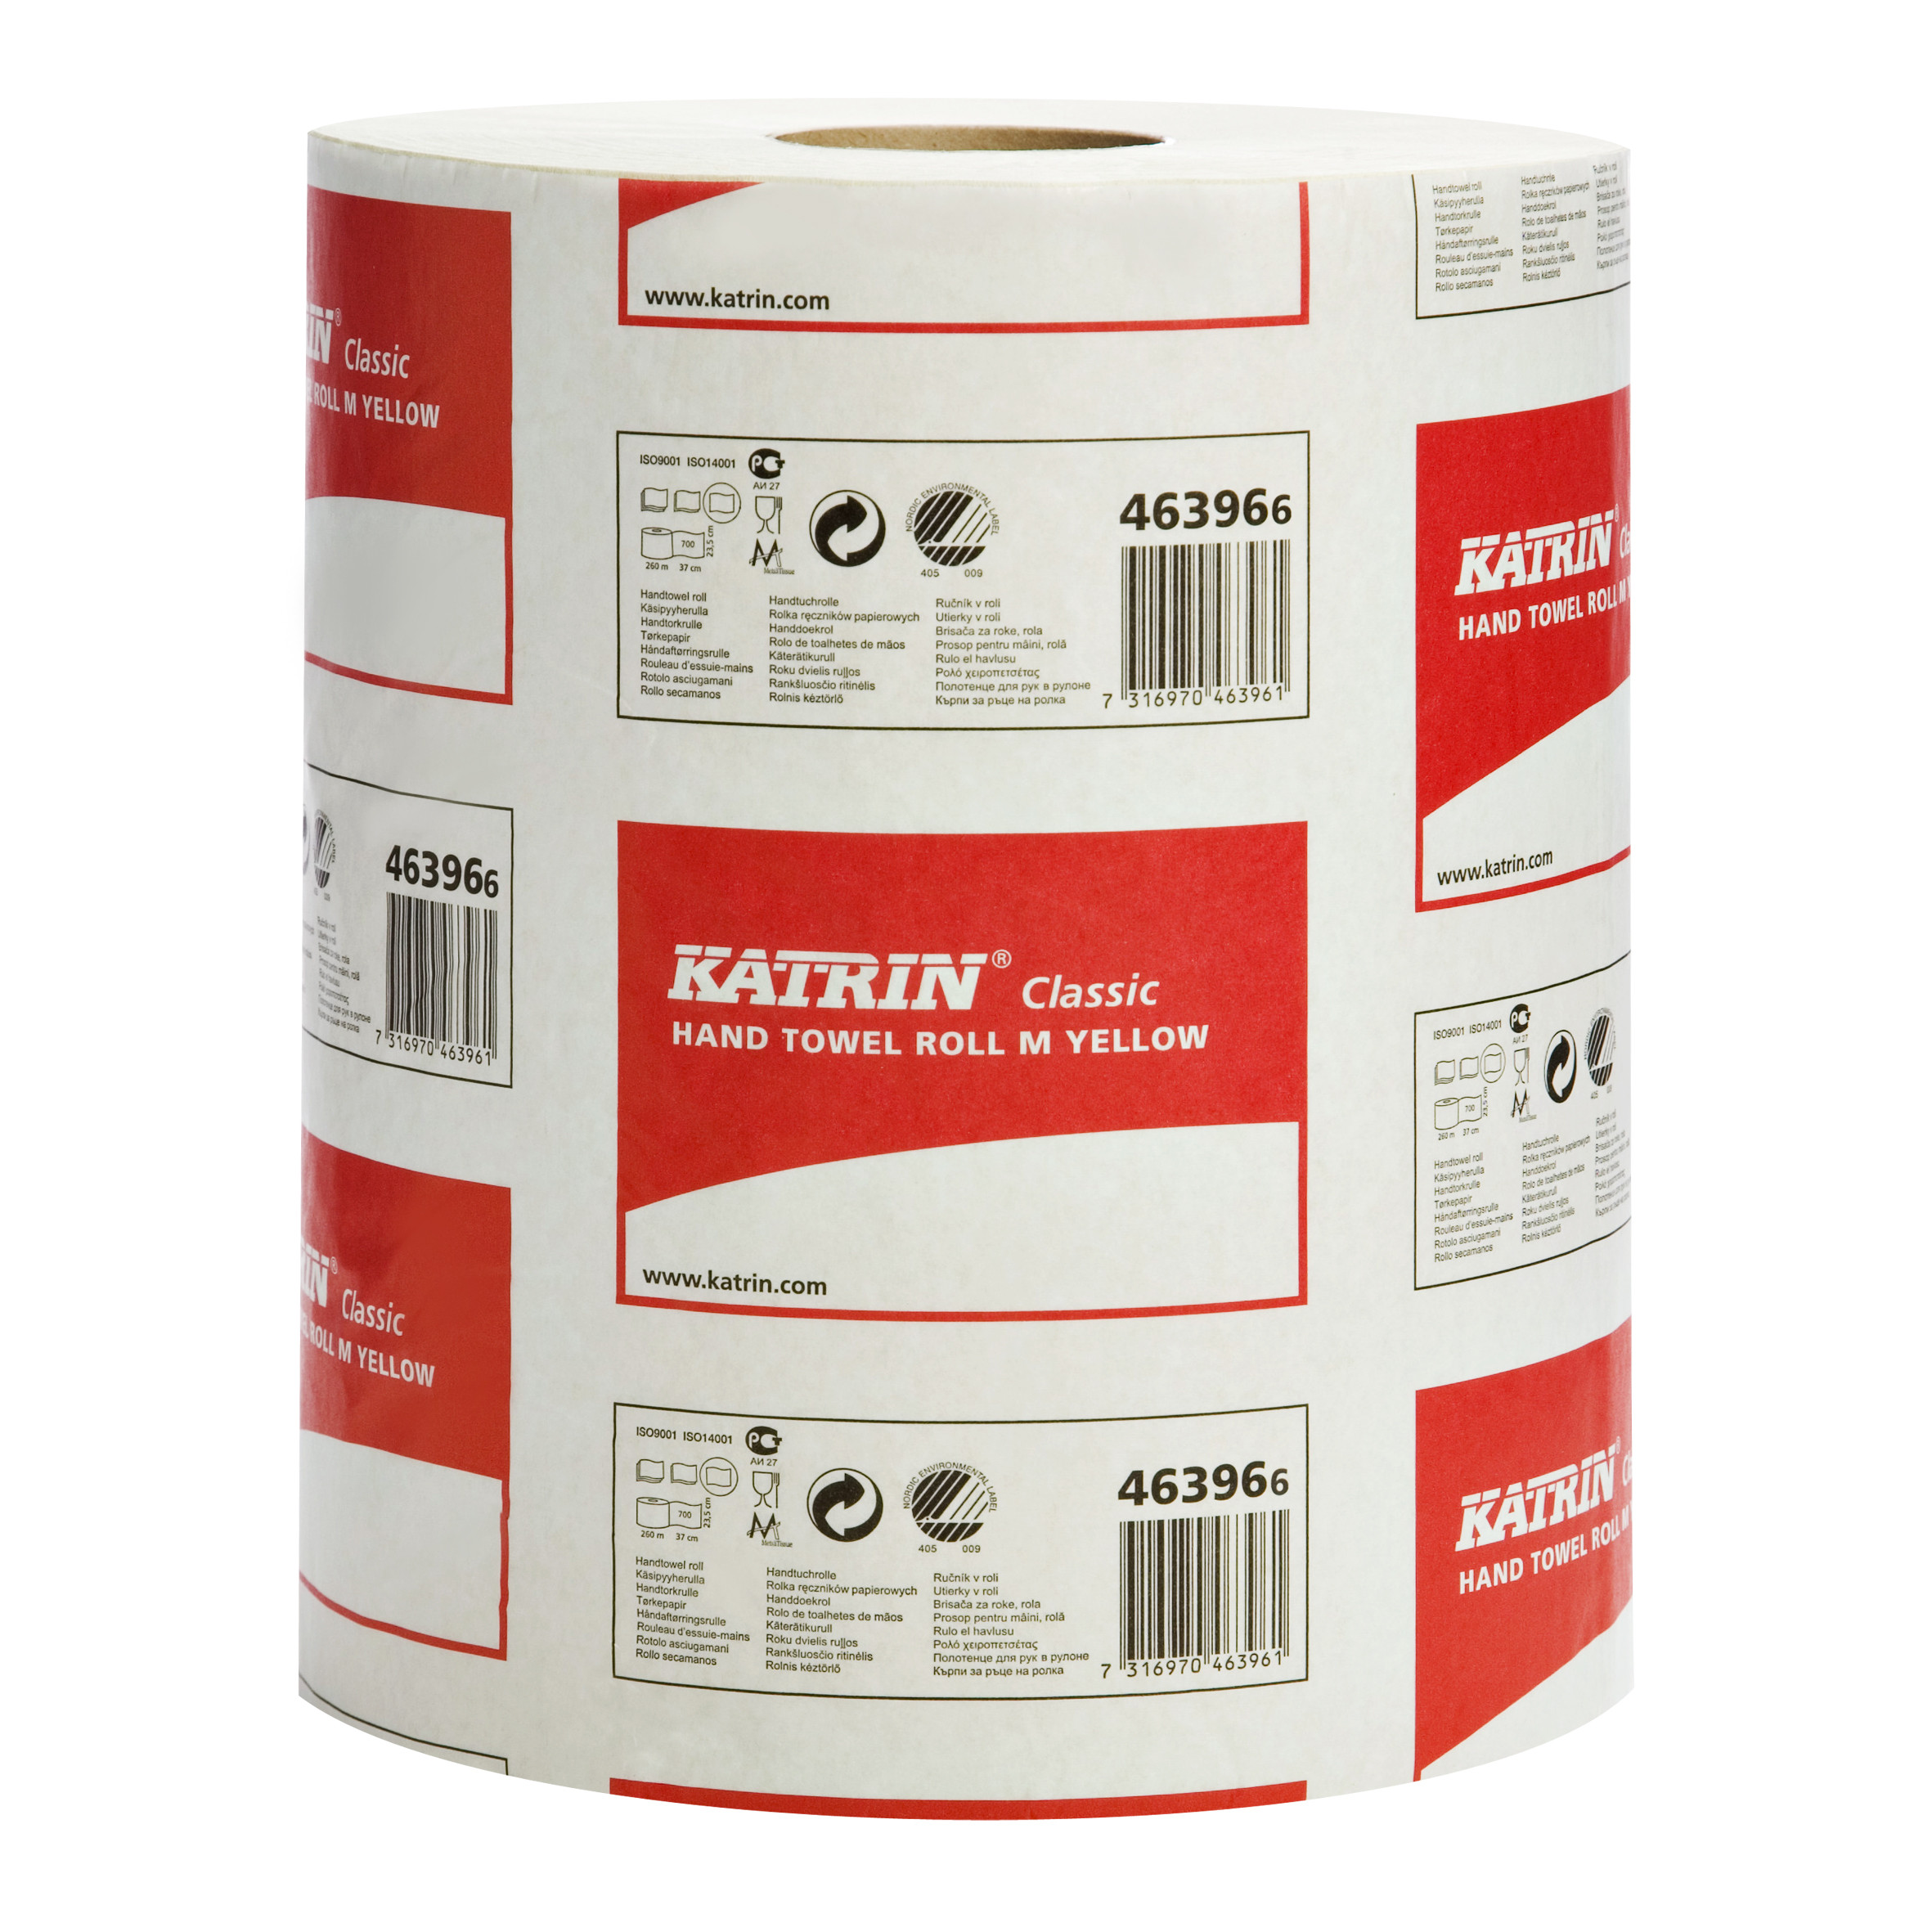 Katrin Classic Hand Towel Roll M Yellow